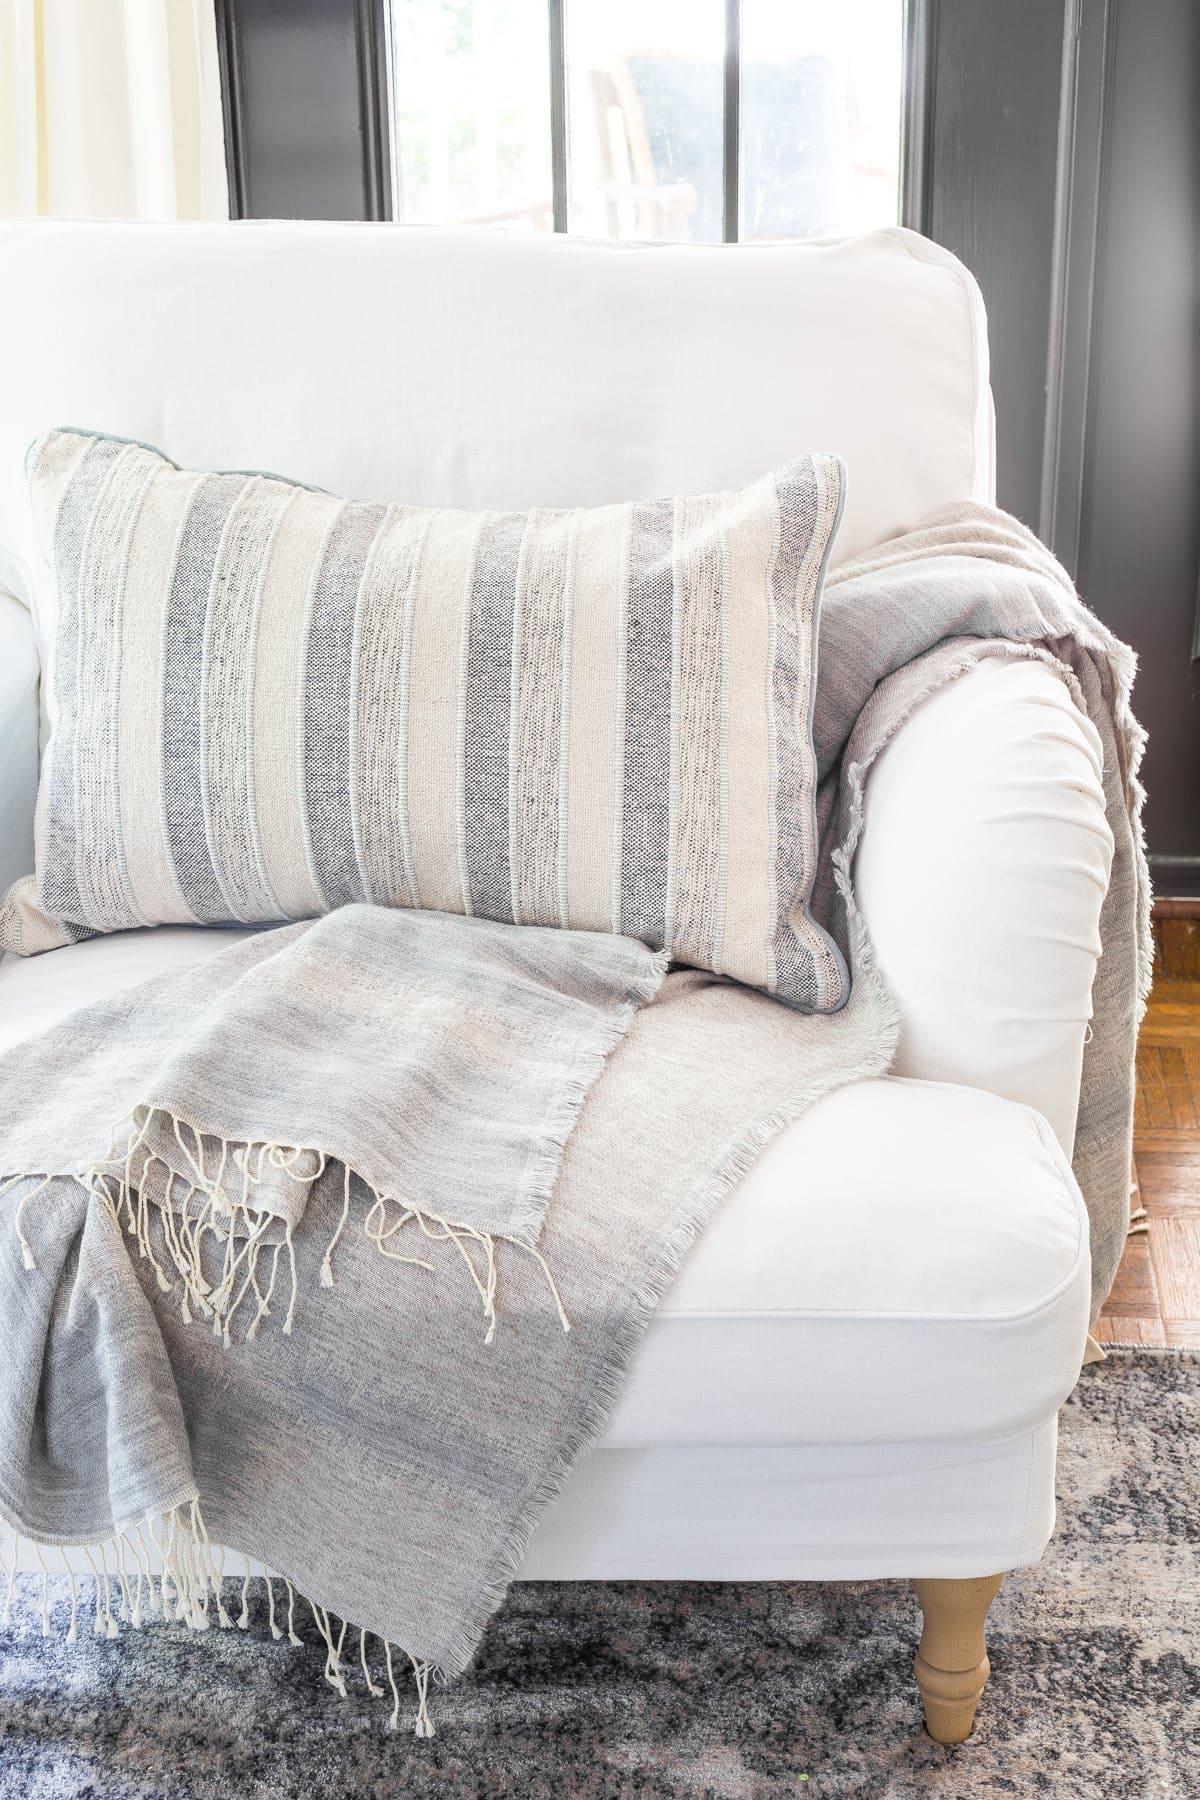 IKEA Stocksund armchair with Bemz slipcover